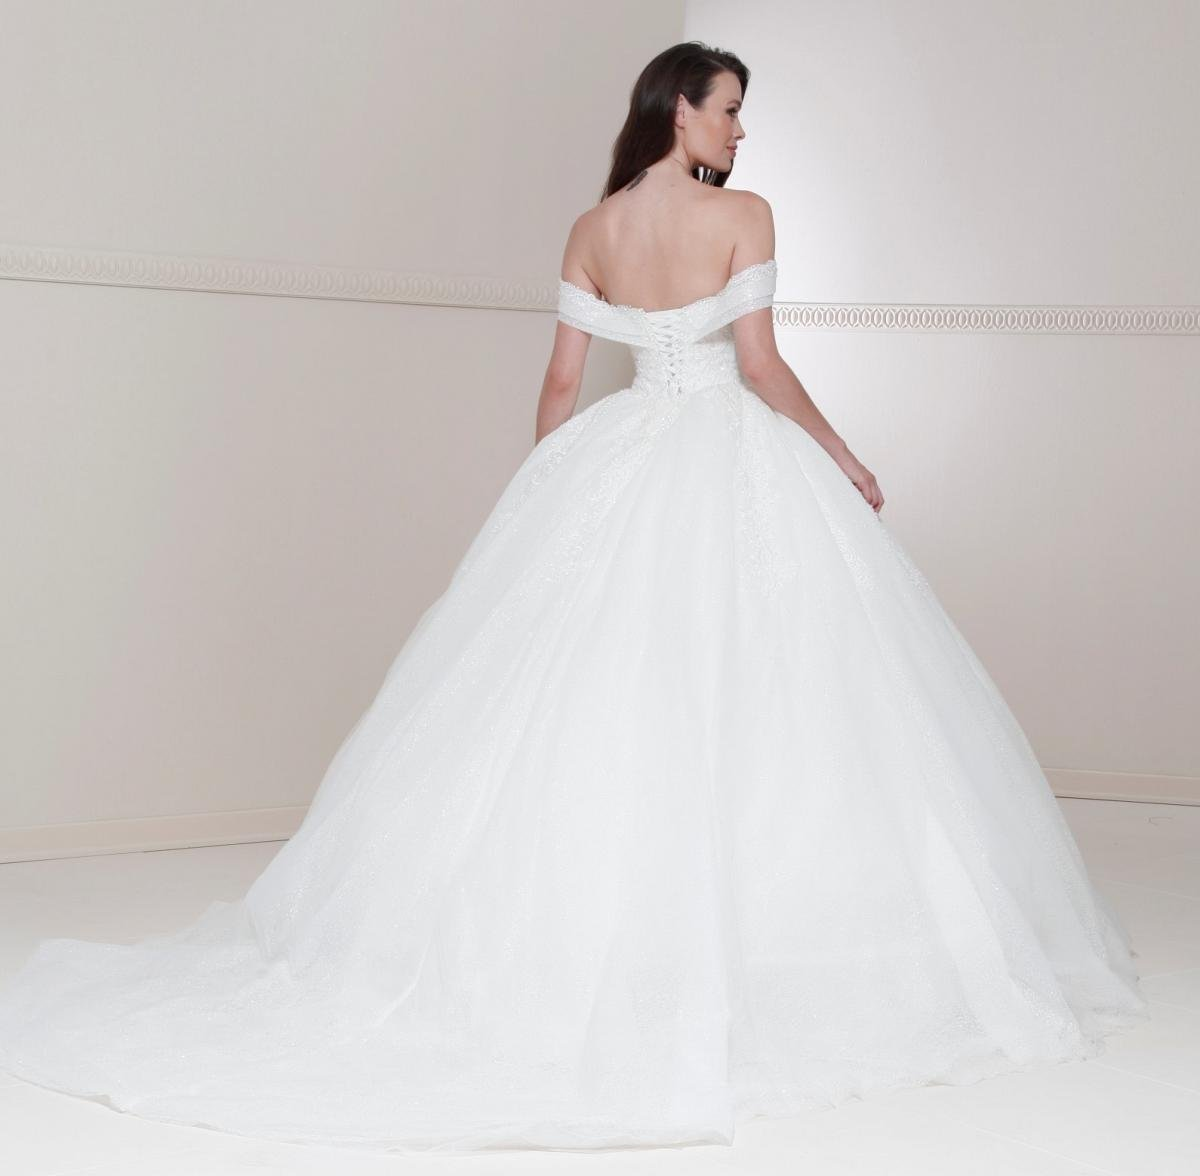 celli-spose-sposa-2022_CRYSTALLINE-BRIDALS-1228-2